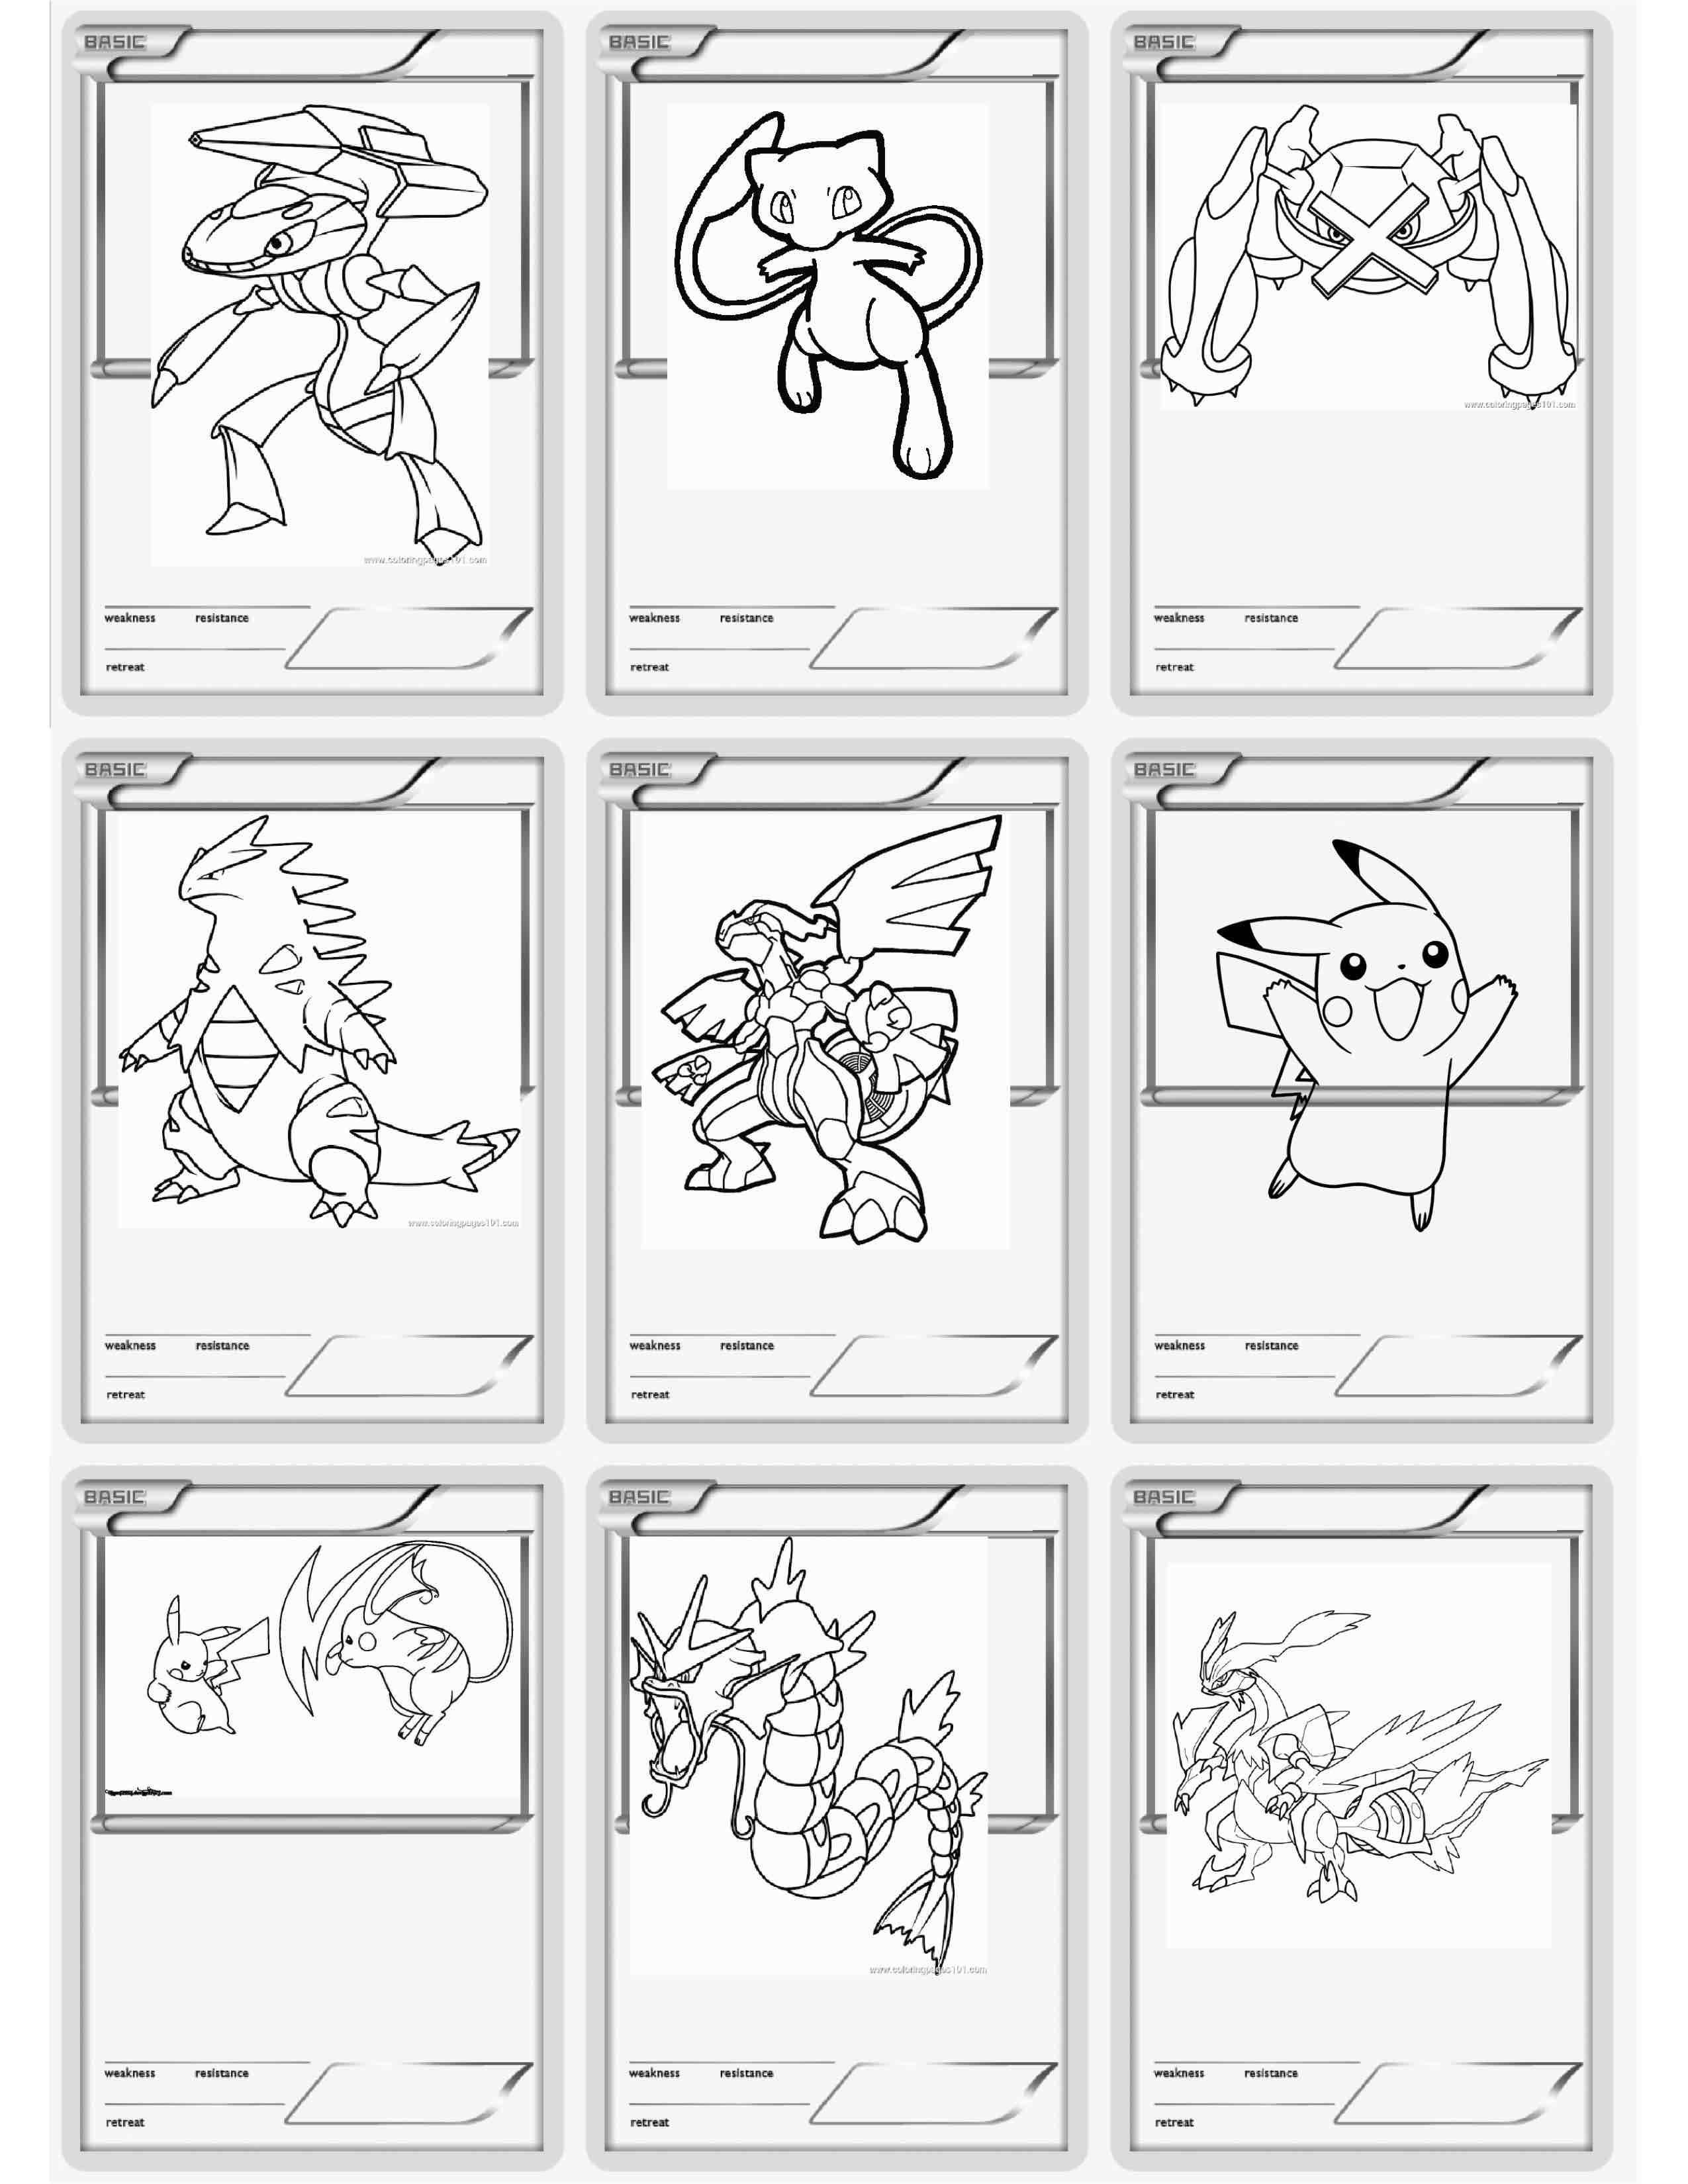 Printable Pokemon Cards - Amber Fillerup Clark  Pokemon coloring